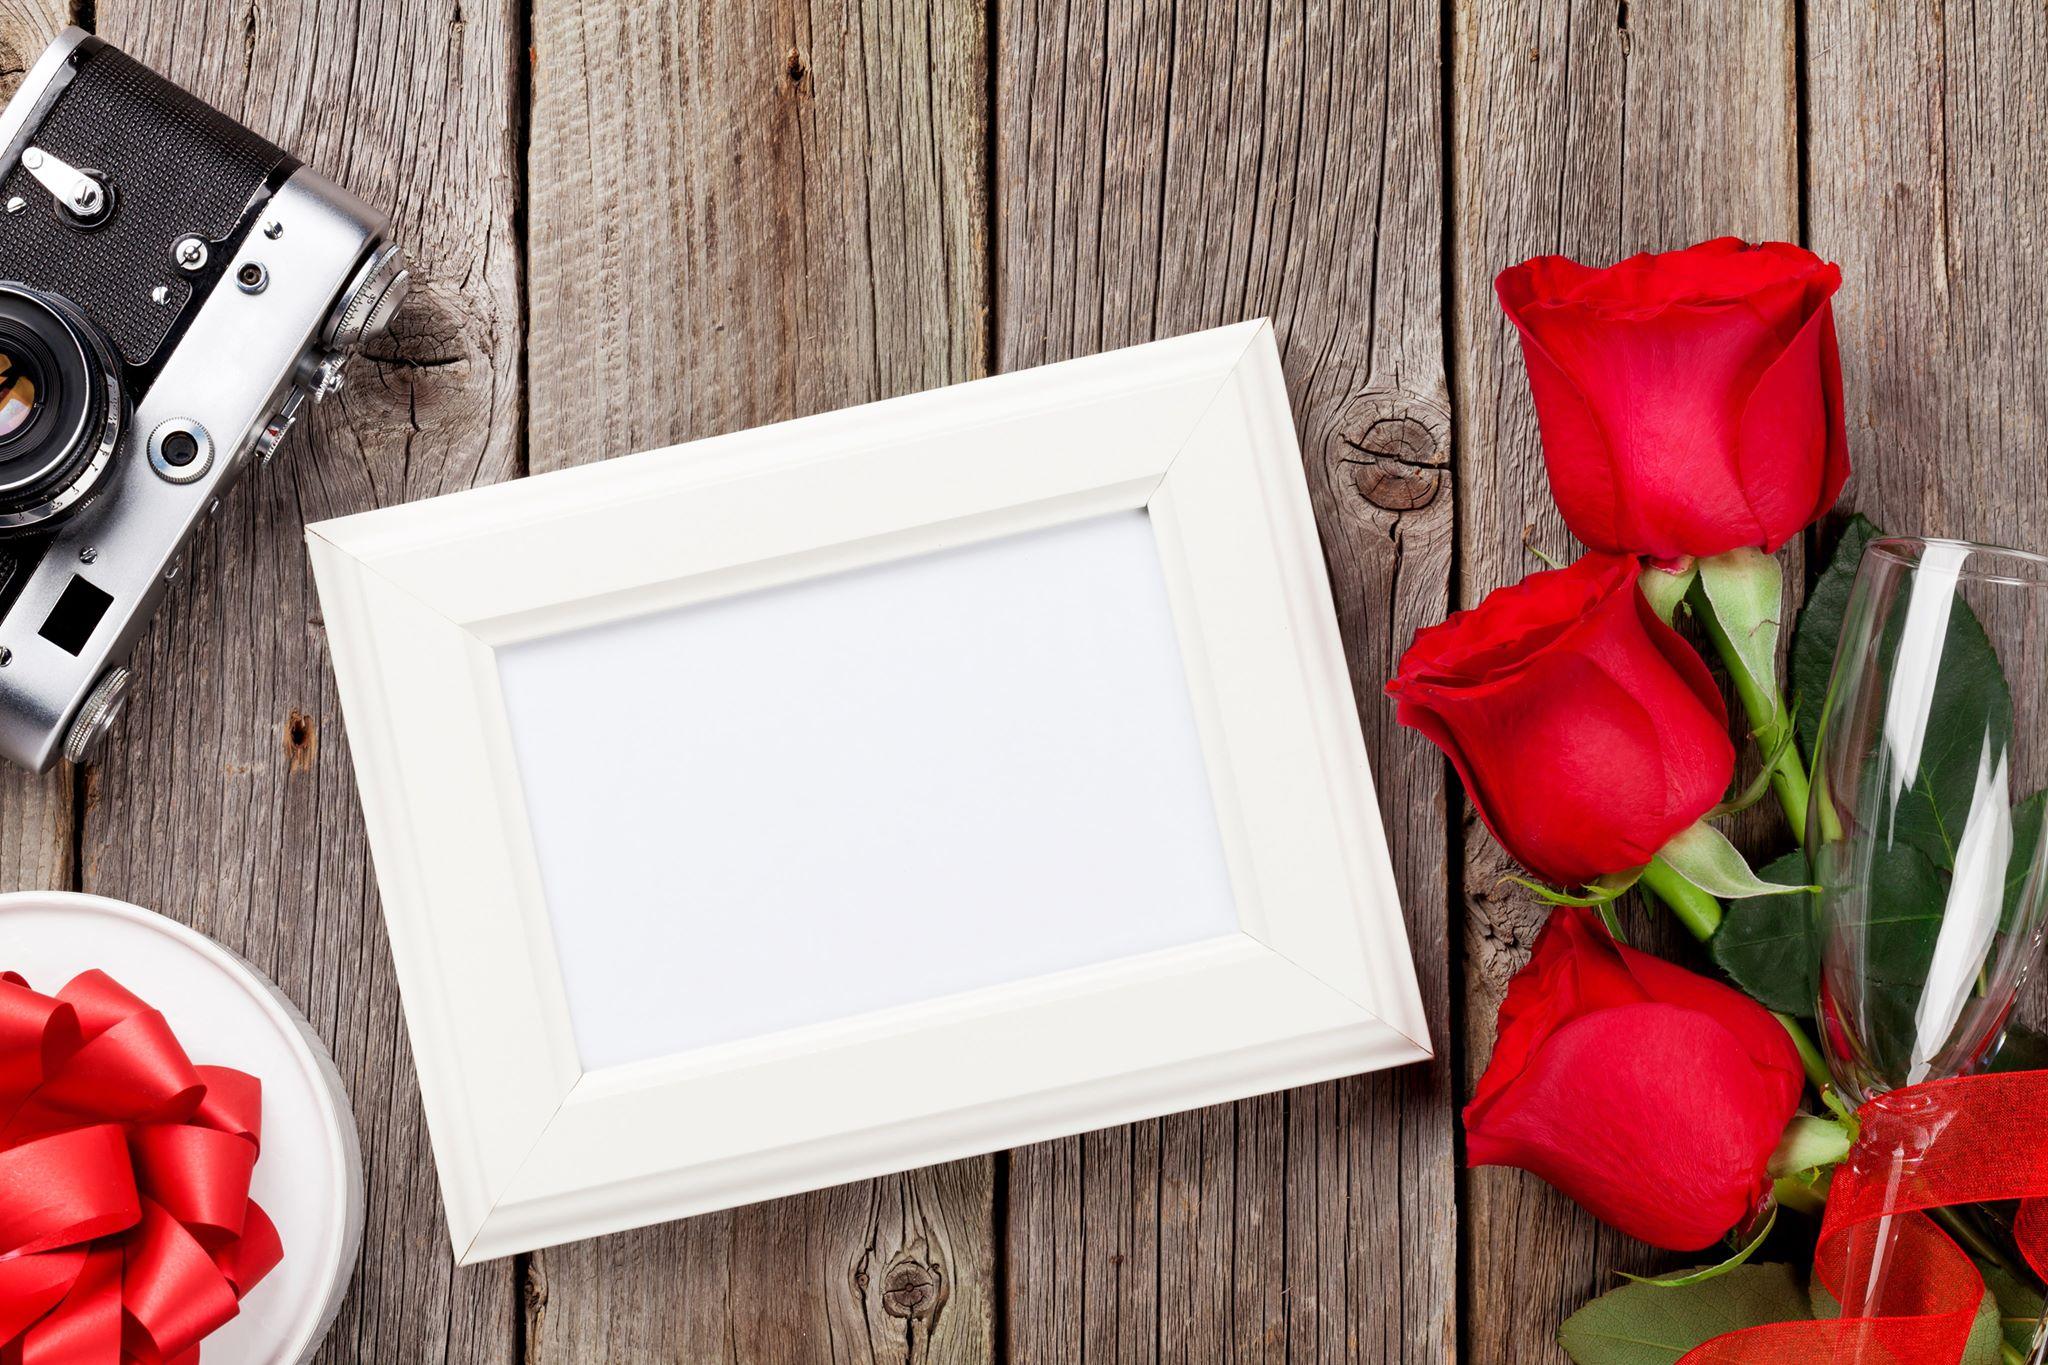 Valentines day images 8 صور عيد الحب